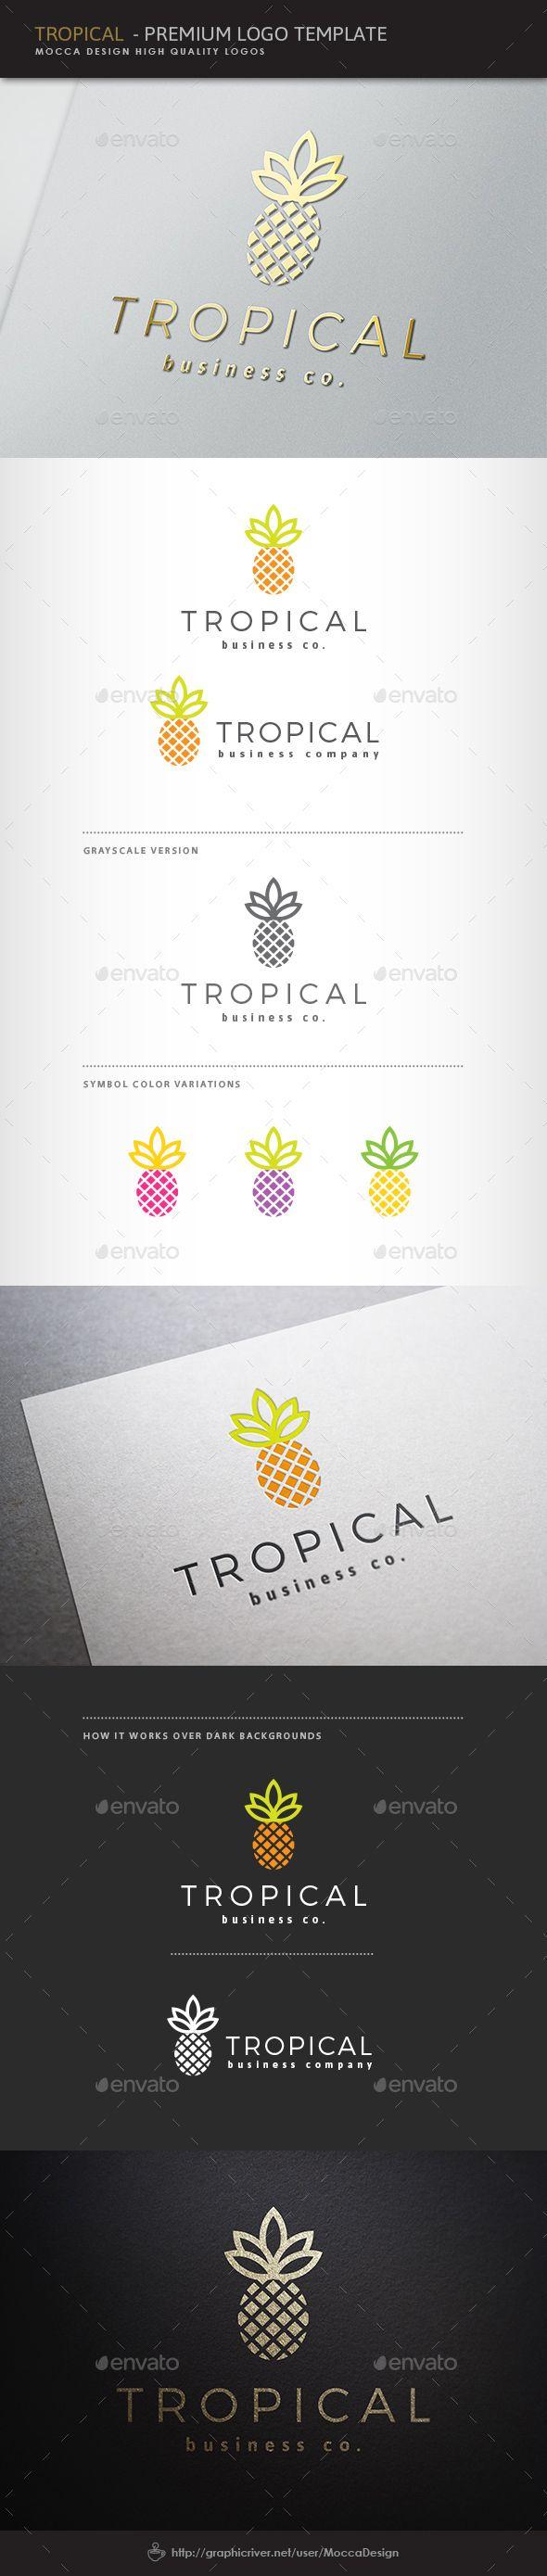 Tropical Logo — Vector EPS #mass media #high tech • Available here → https://graphicriver.net/item/tropical-logo/4443387?ref=pxcr